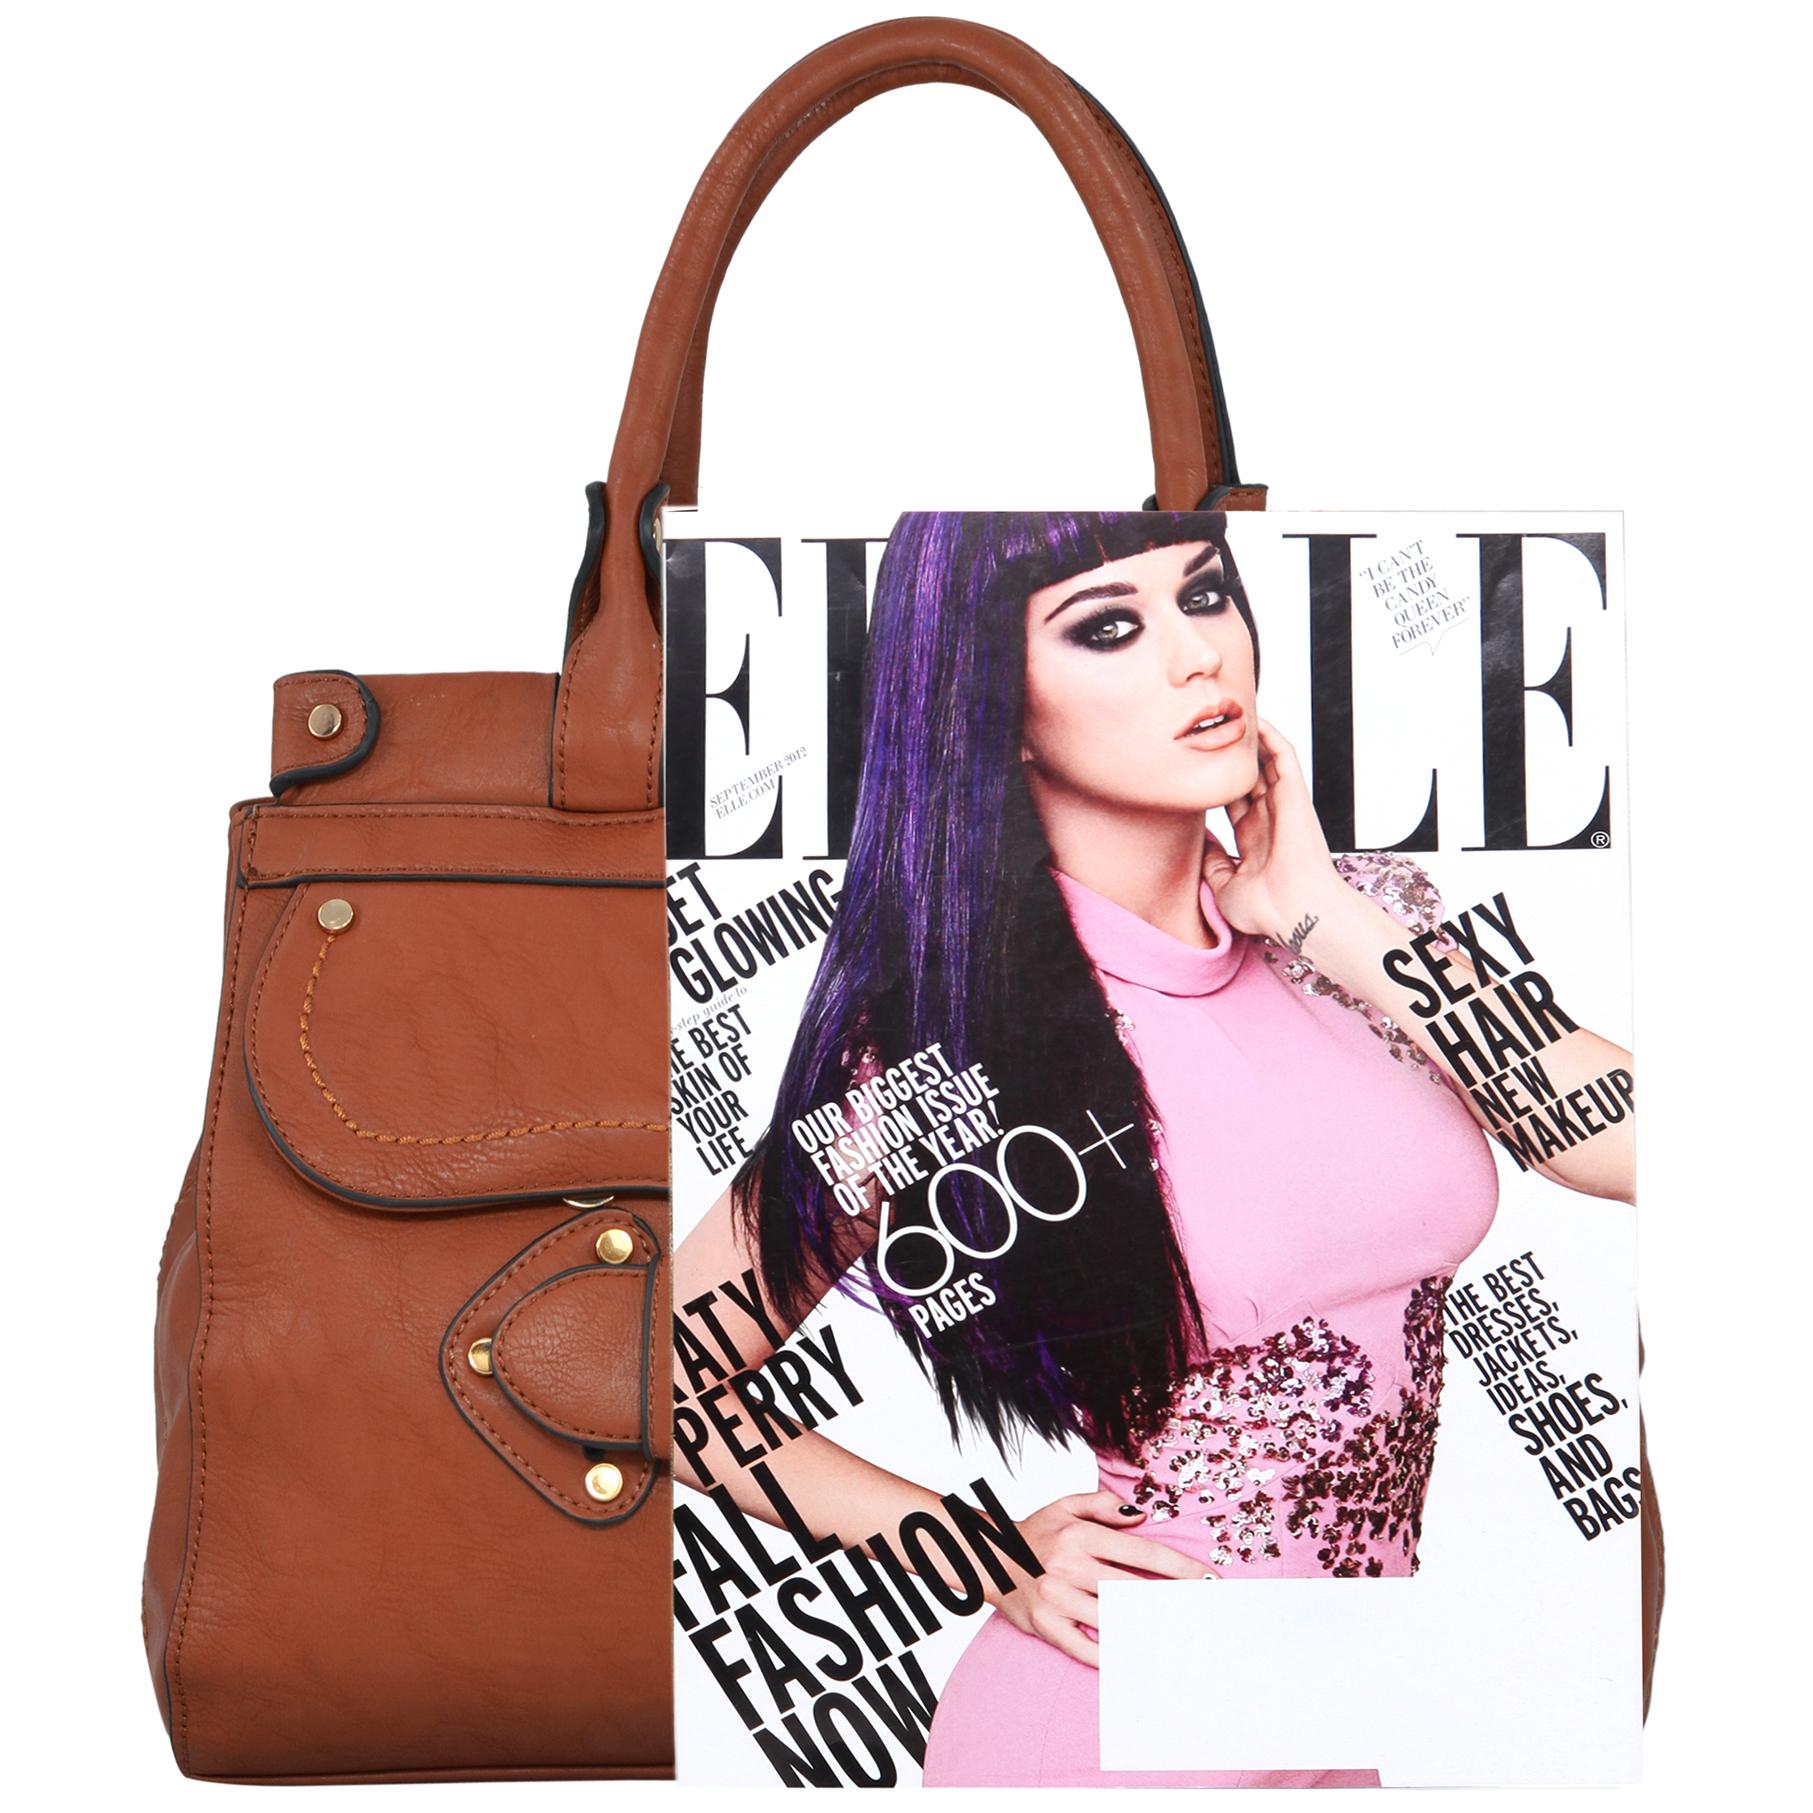 wendy brown satchel style shoulder bag size comparison image